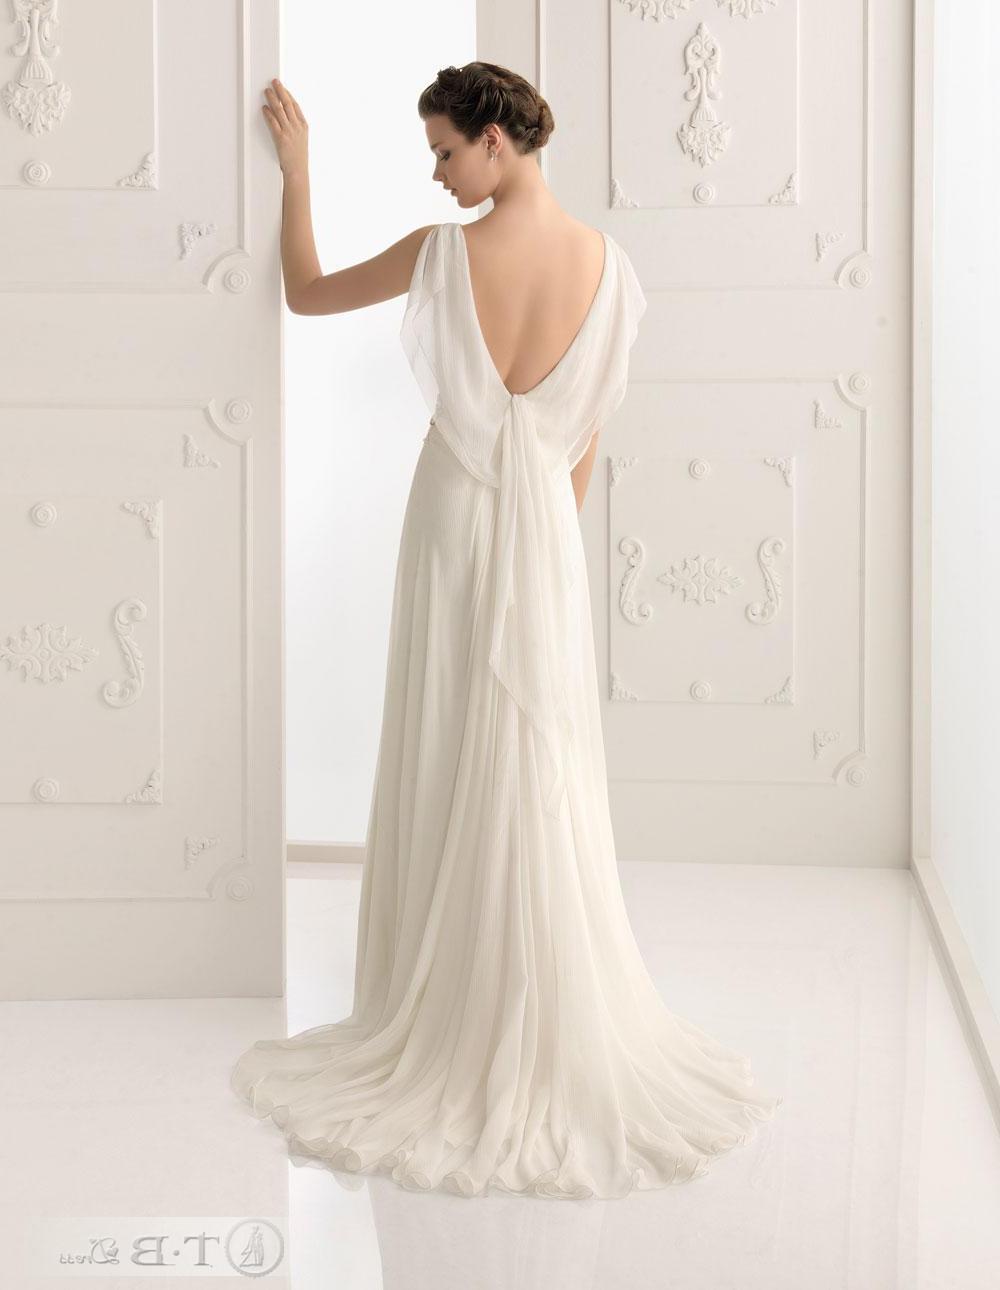 Chic Sheath Column V-neck Floor-length Court Wedding Dresses 2012 New Style